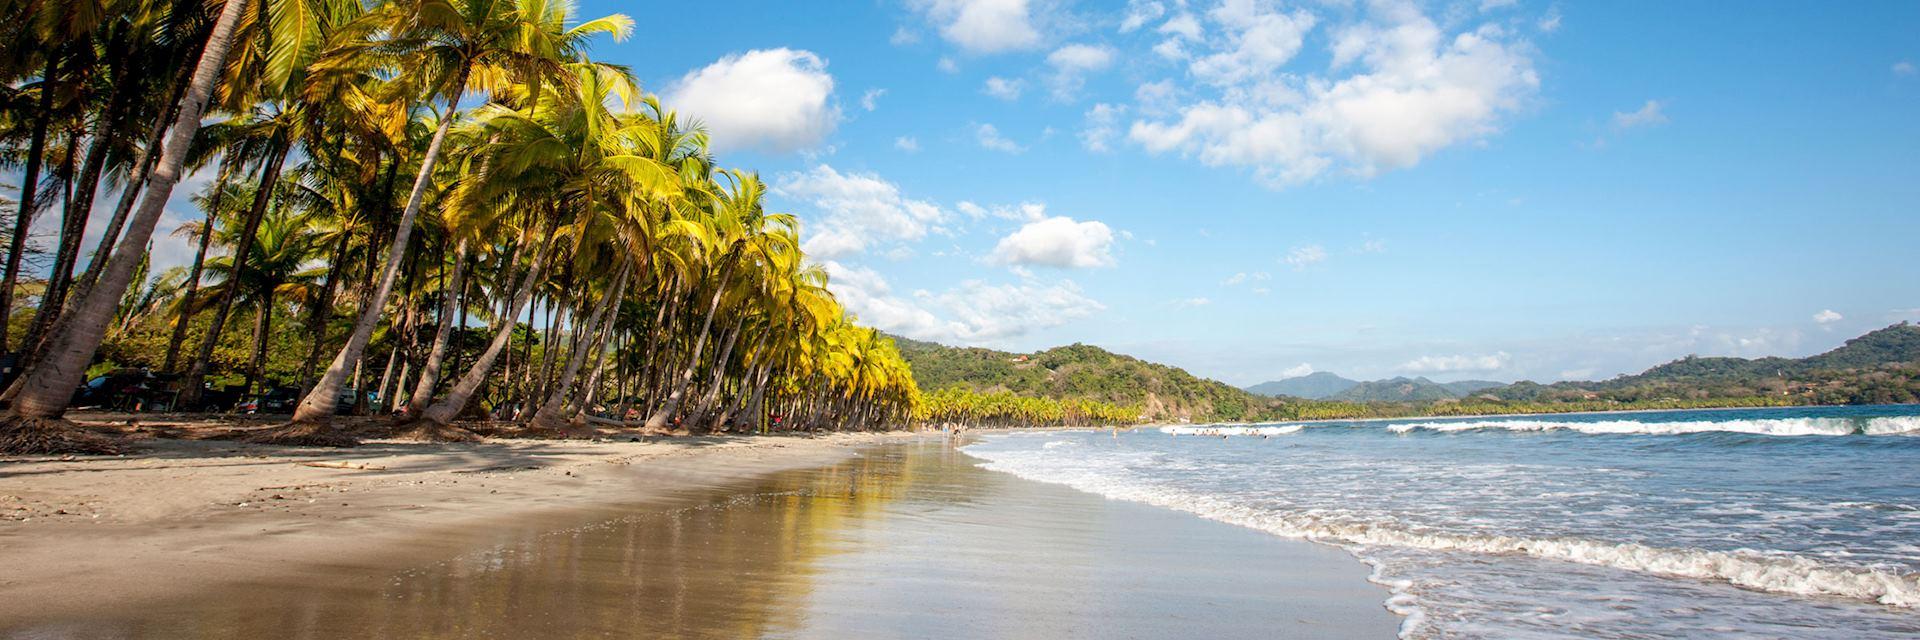 Costa Rica's Nicoya Peninsula